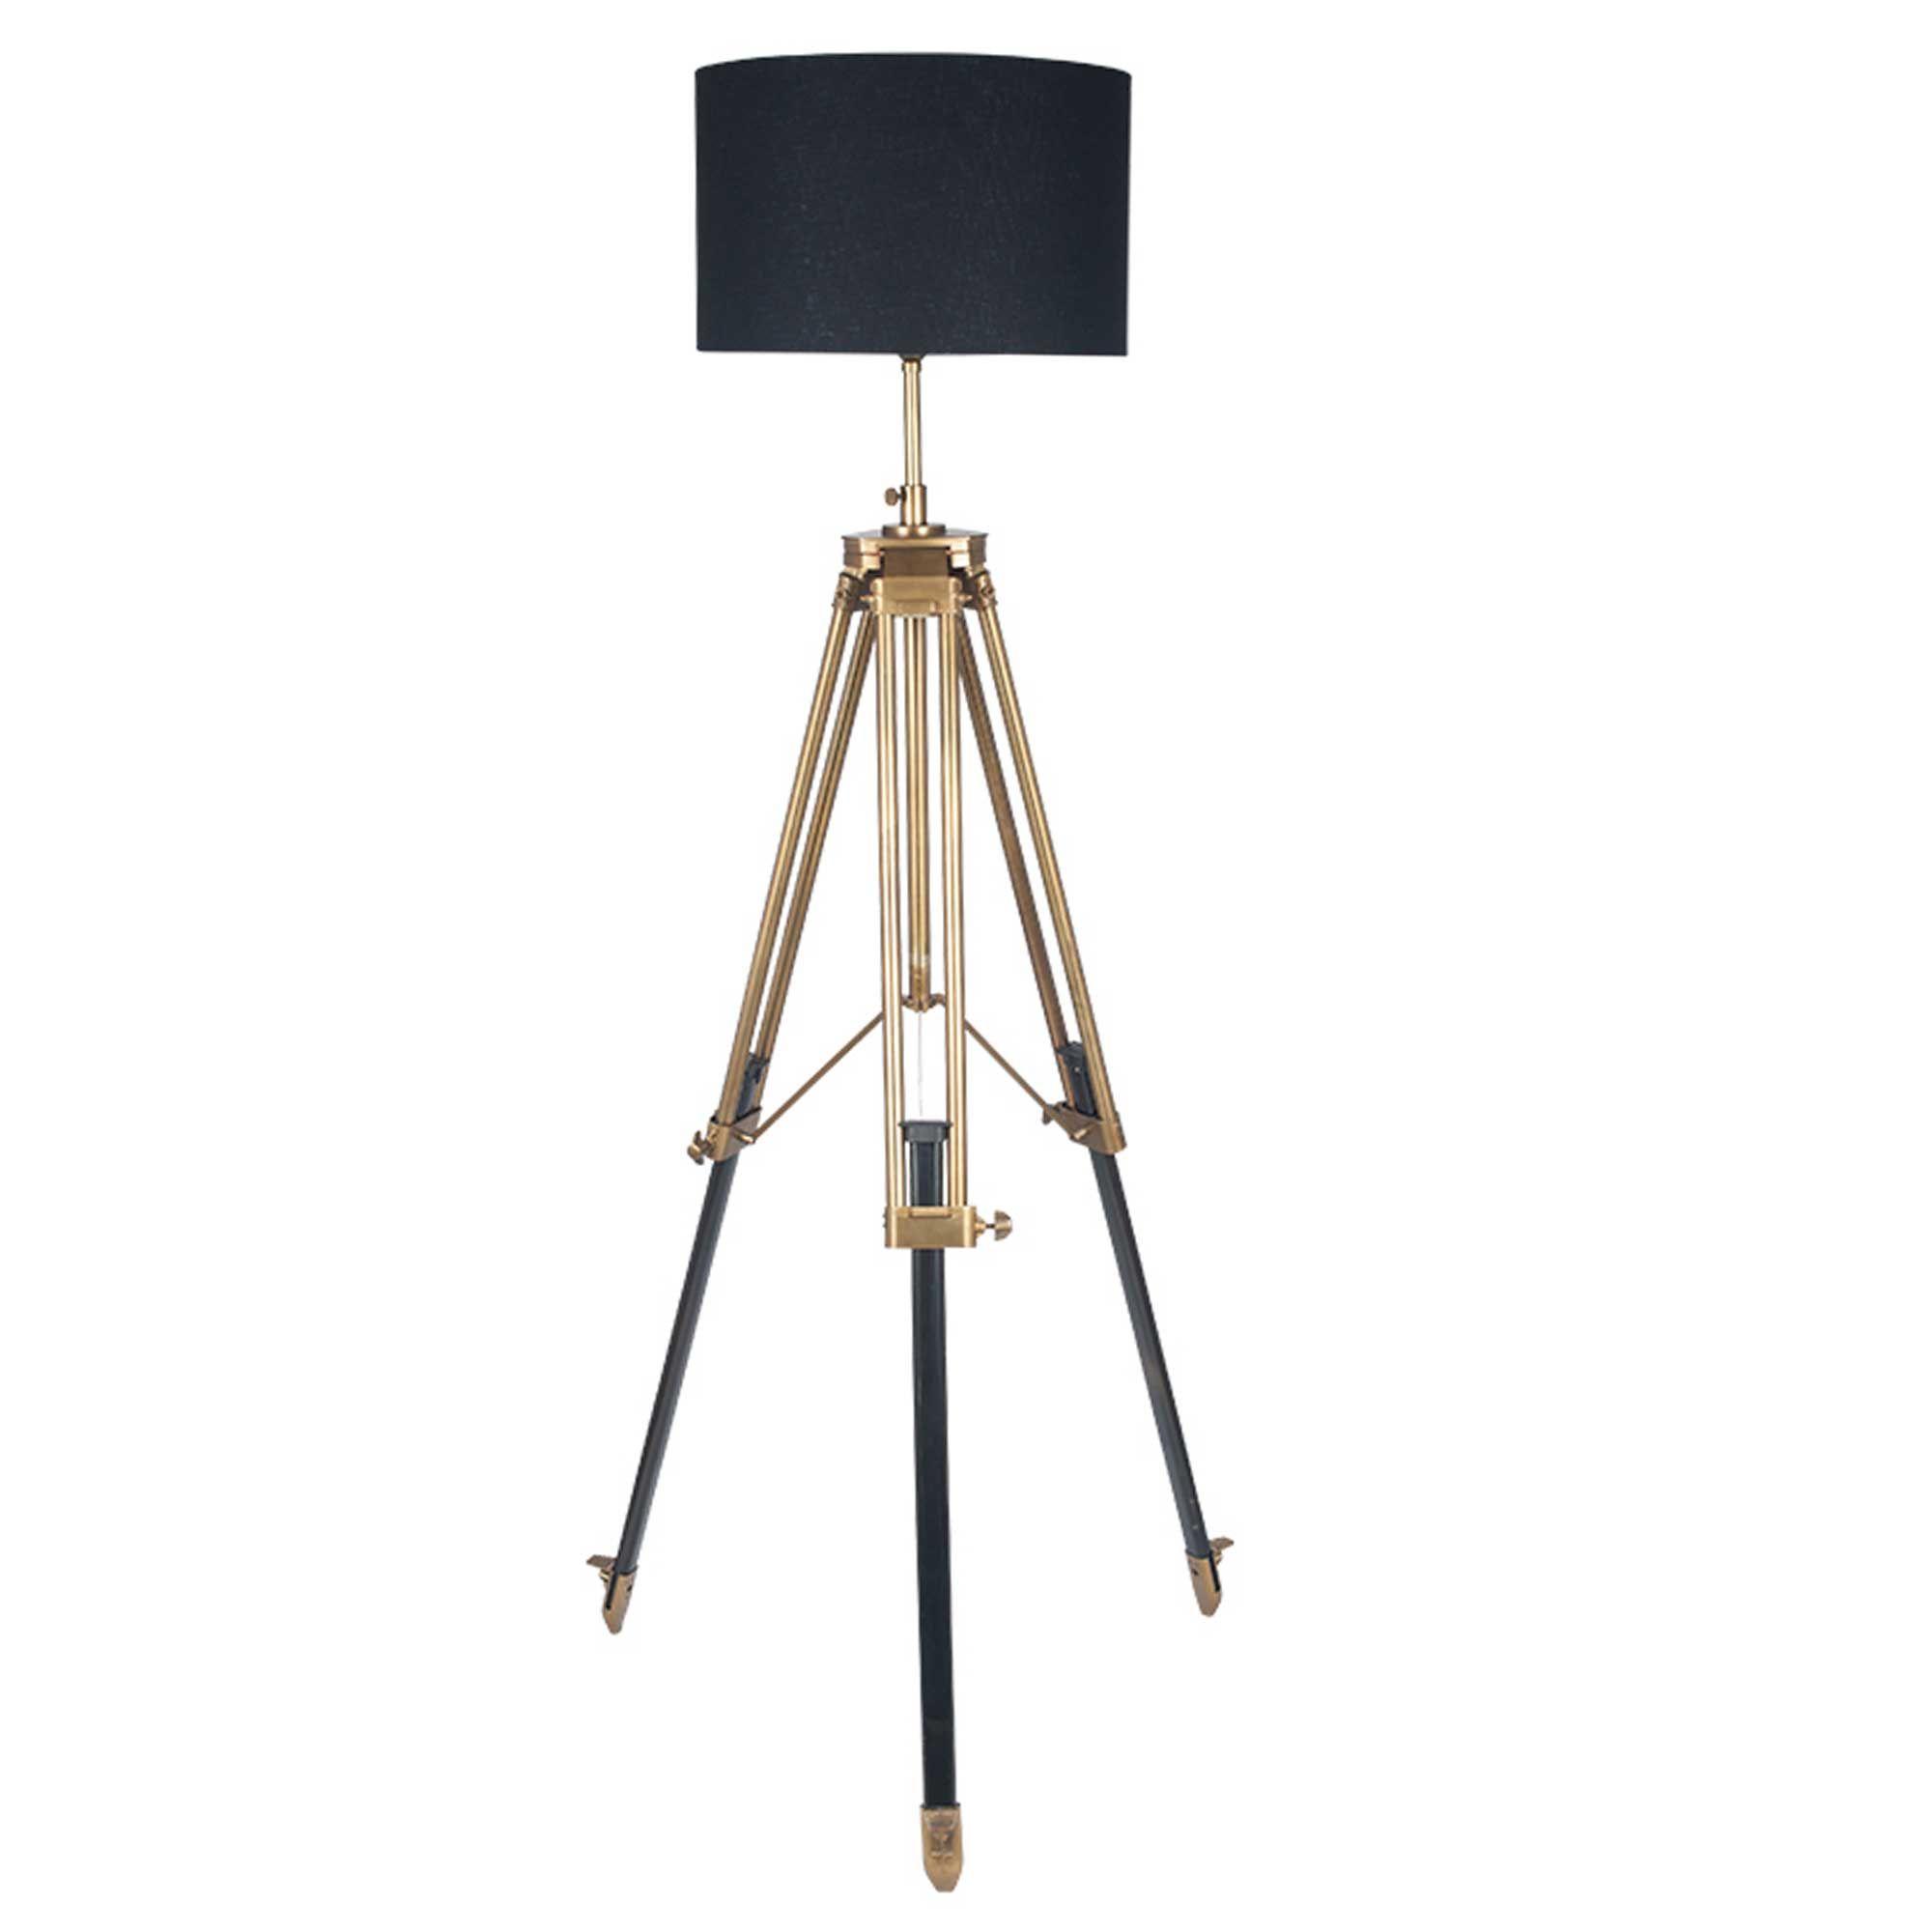 Antique Brass Tripod Floor Lamp Dark Wood Tripod Floor Lamps Brass Tripod Floor Lamp Lamp